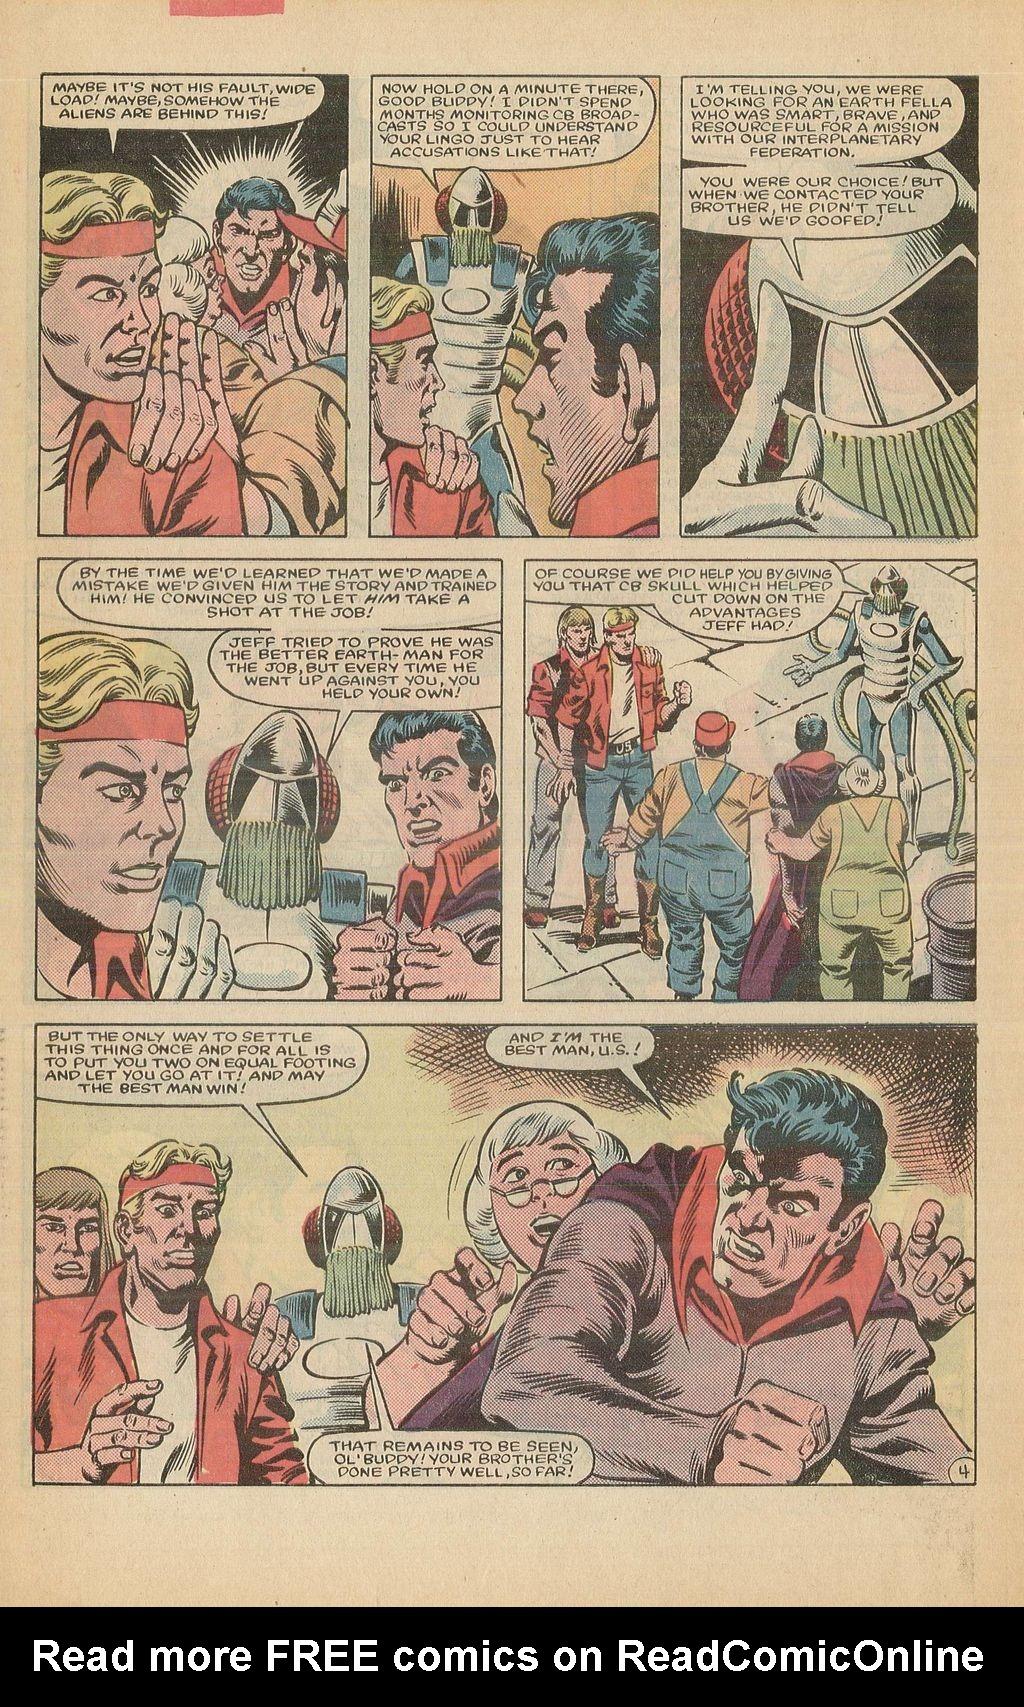 Read online U.S. 1 comic -  Issue #12 - 6